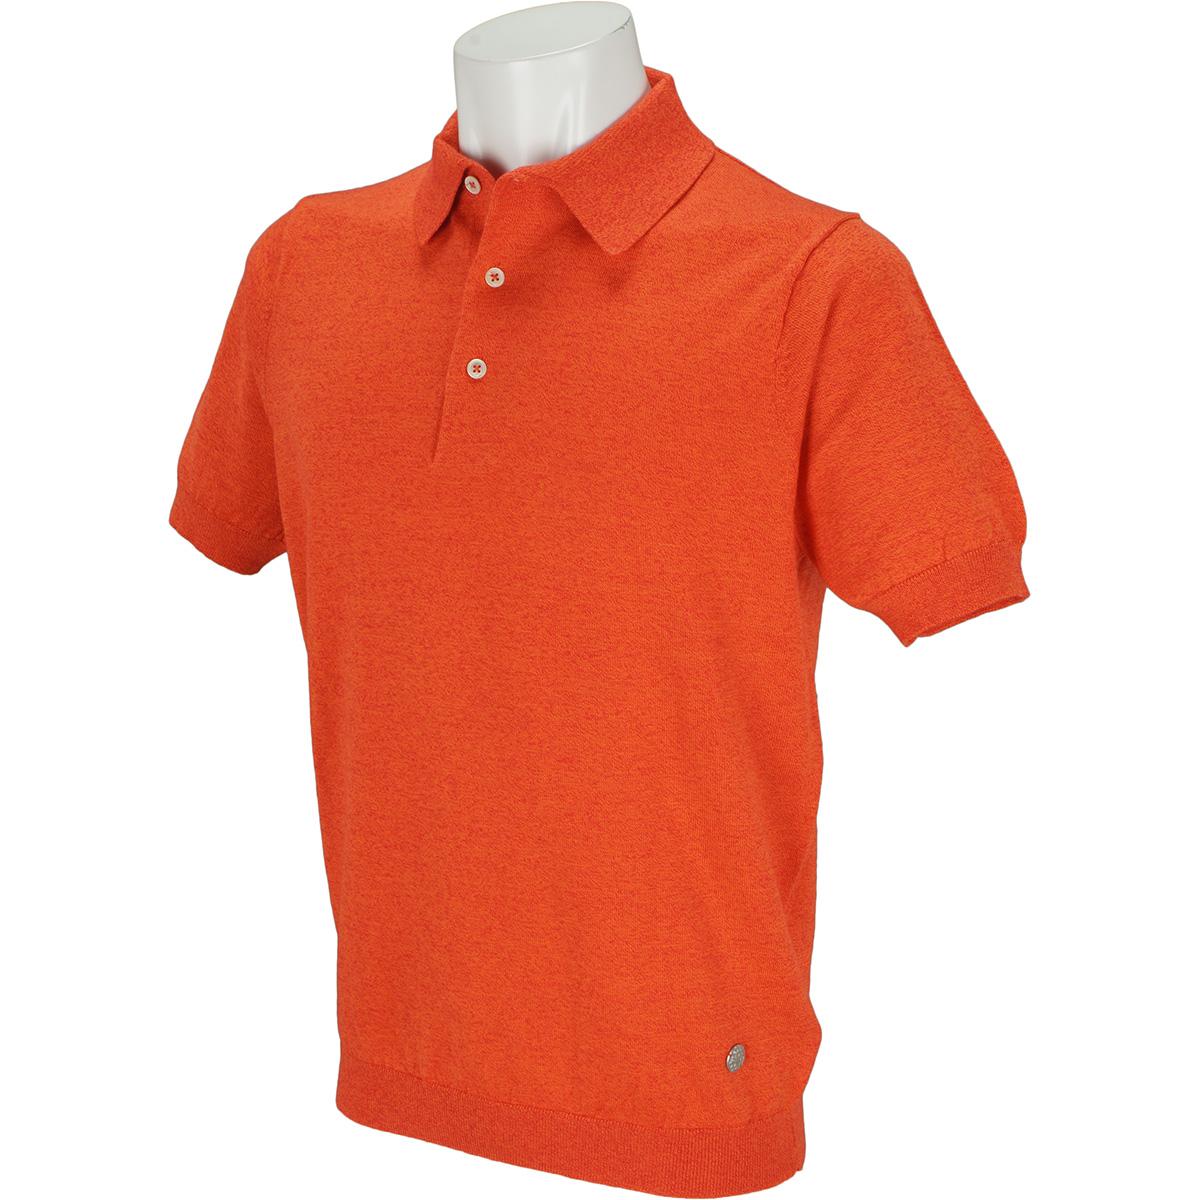 Hockey半袖ポロシャツ